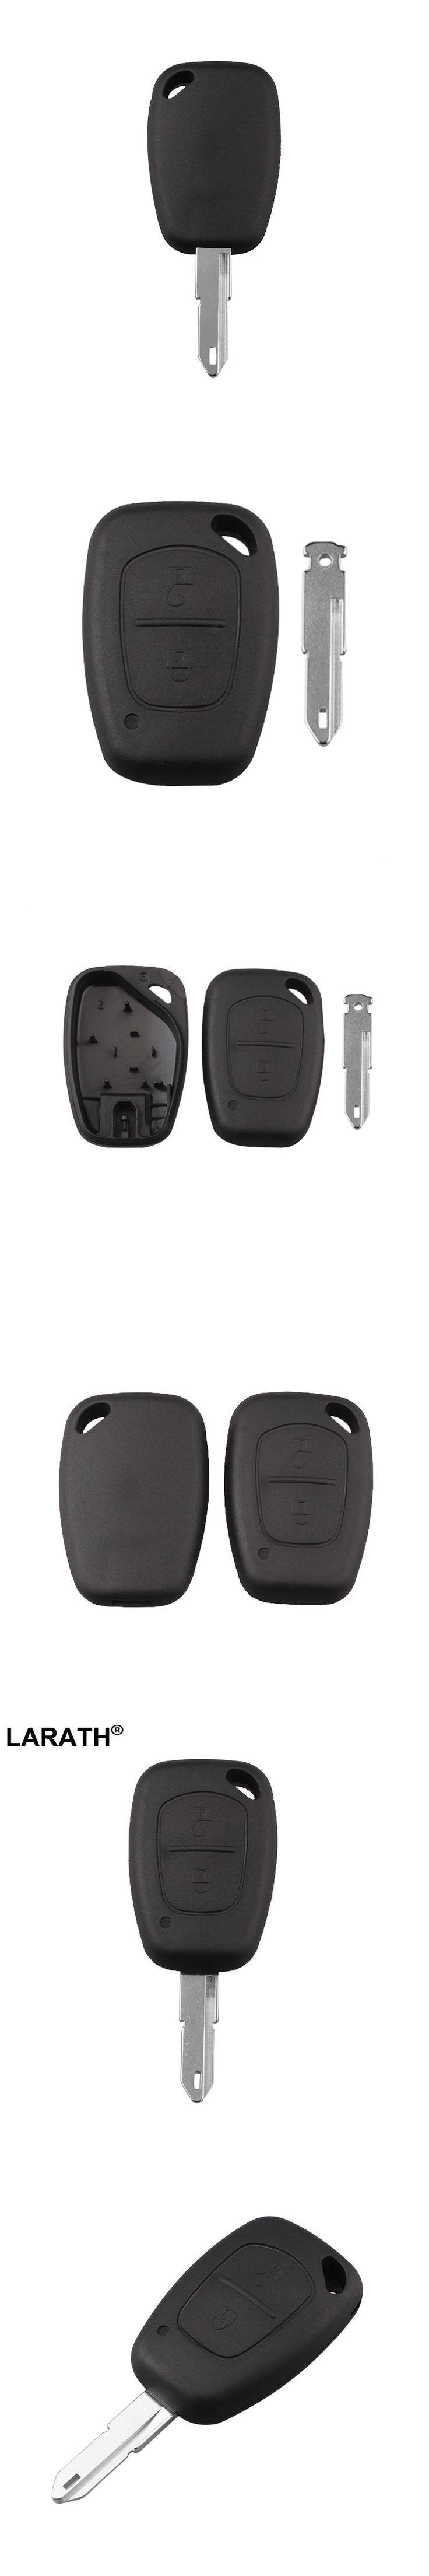 LARATH Uncut Key Shell For Opel Vivaro Movano Renault Traffic Kangoo For Nissan 2 Button Remote Car Key Cover FOB Shell Case